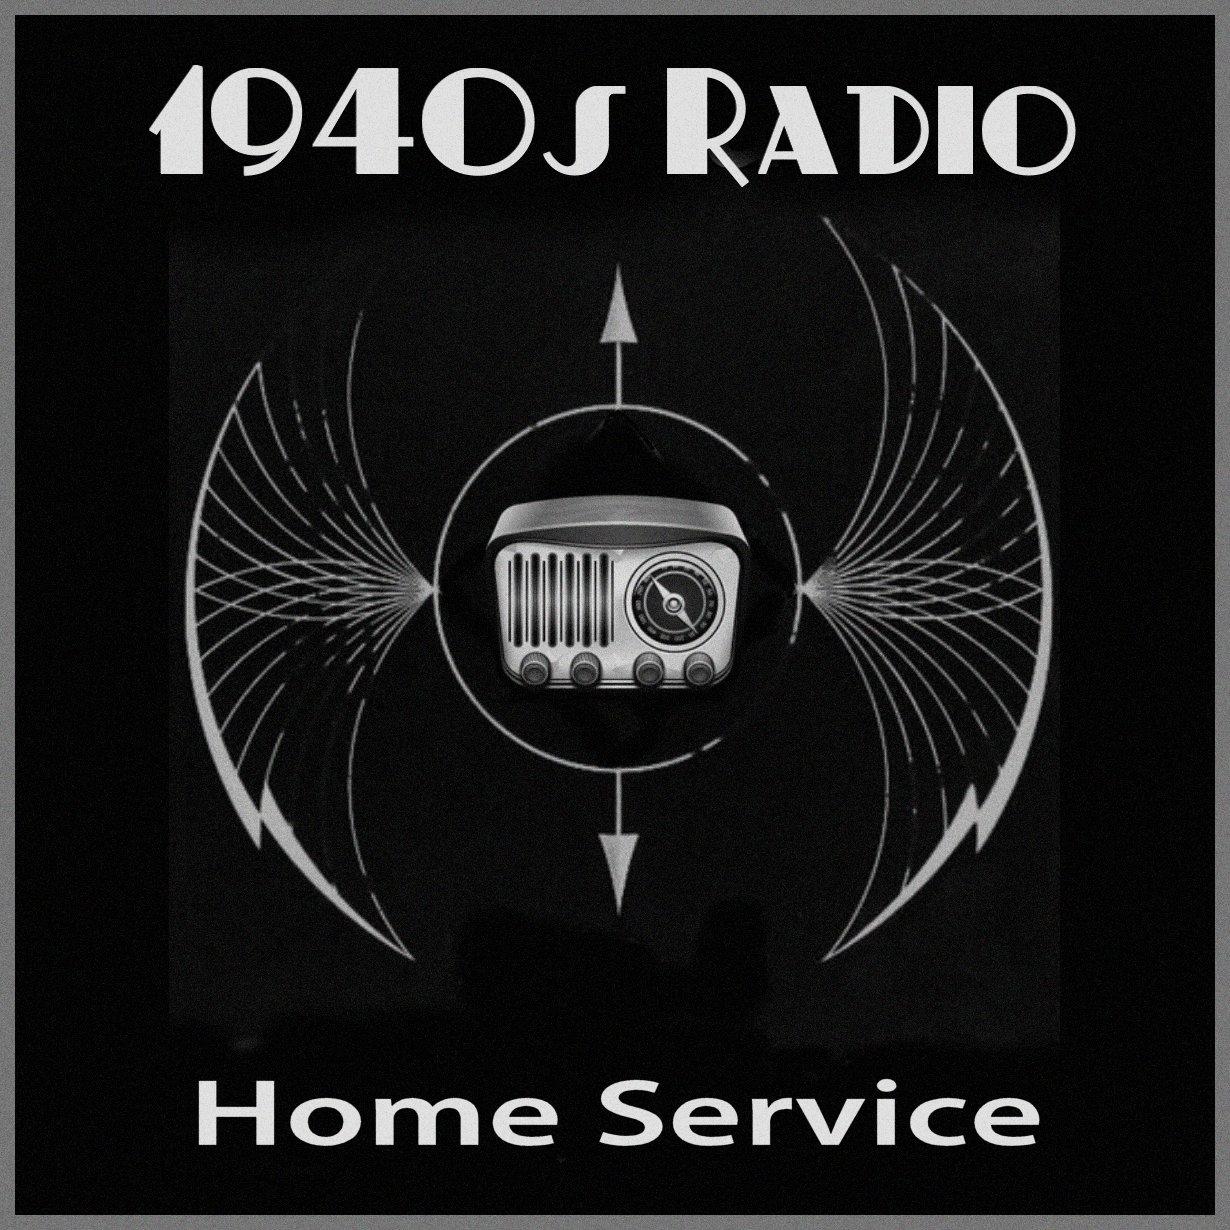 1940s Radio - Home Service - 1930s 1940s 1950s (Pumpkin FM OTRN)